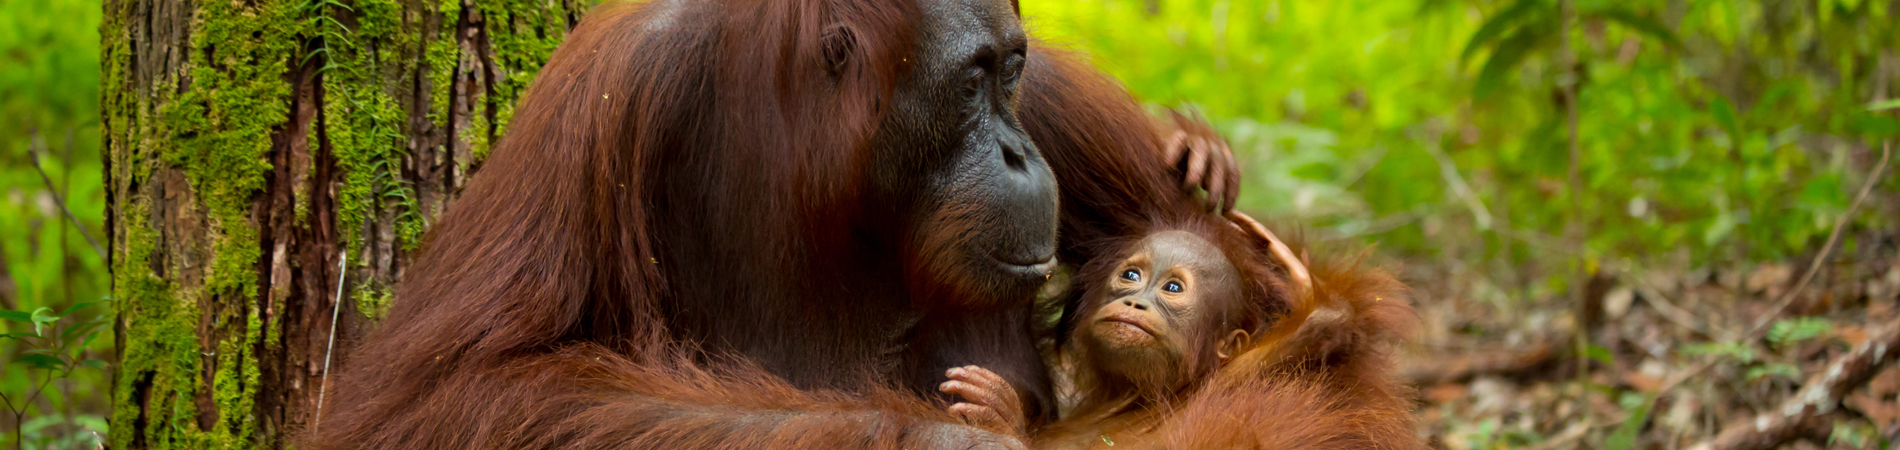 shutterstock_bor orang utan baby header